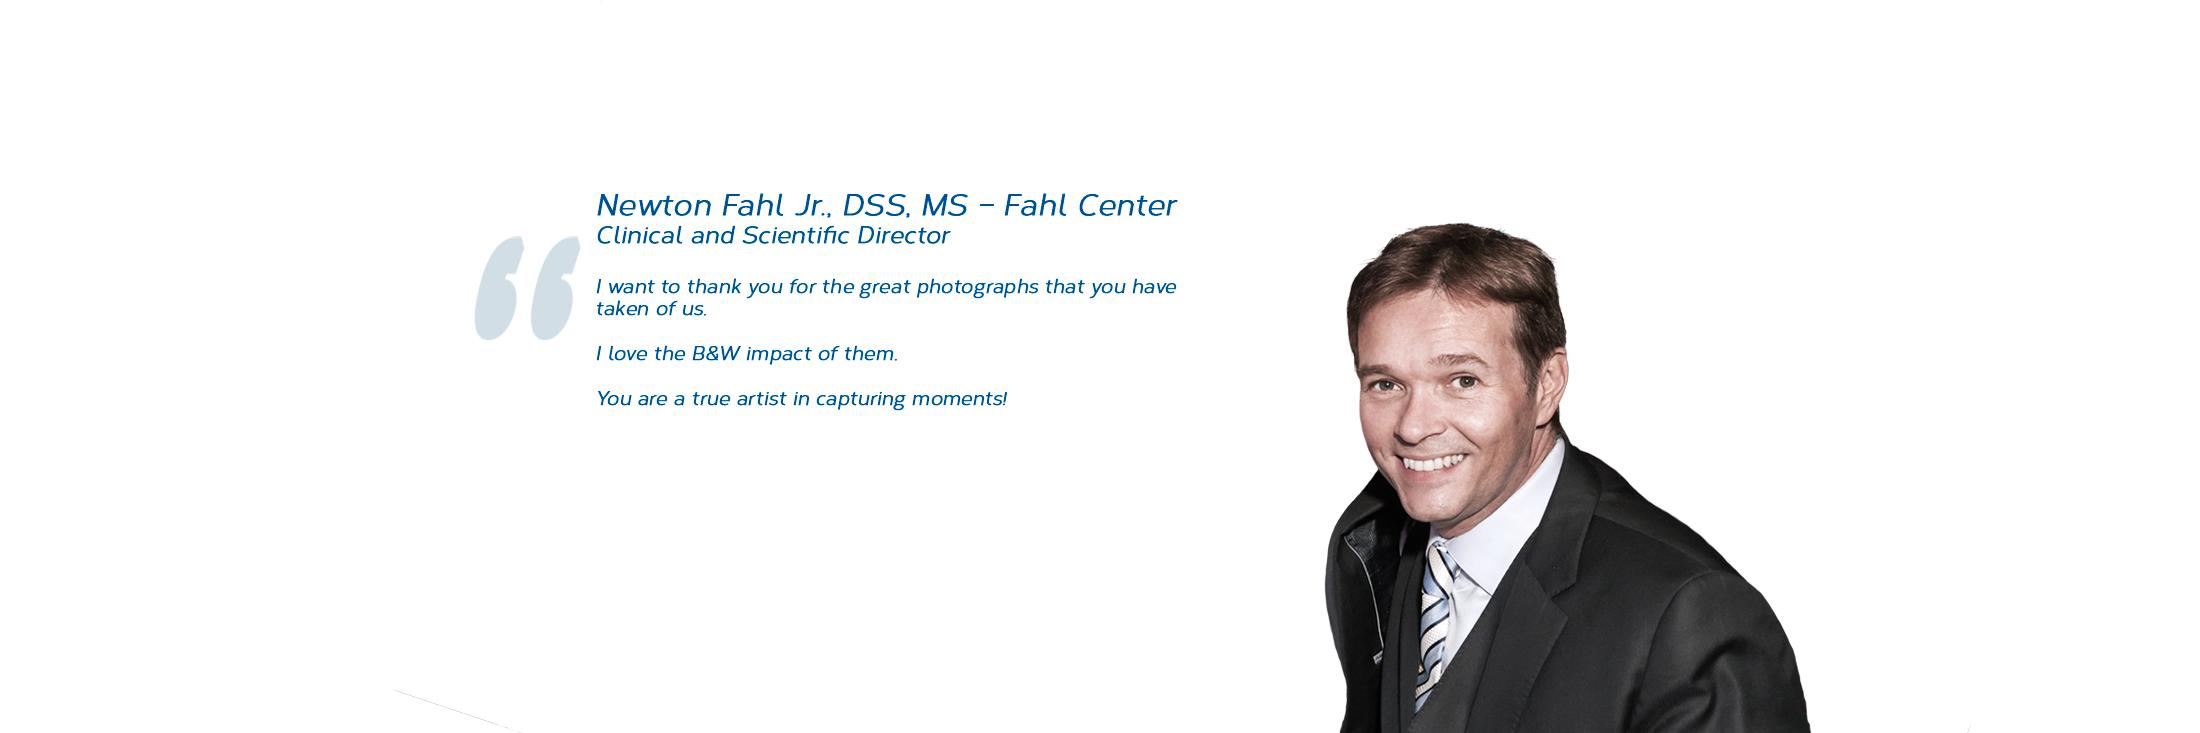 Dr. Newton Fahl